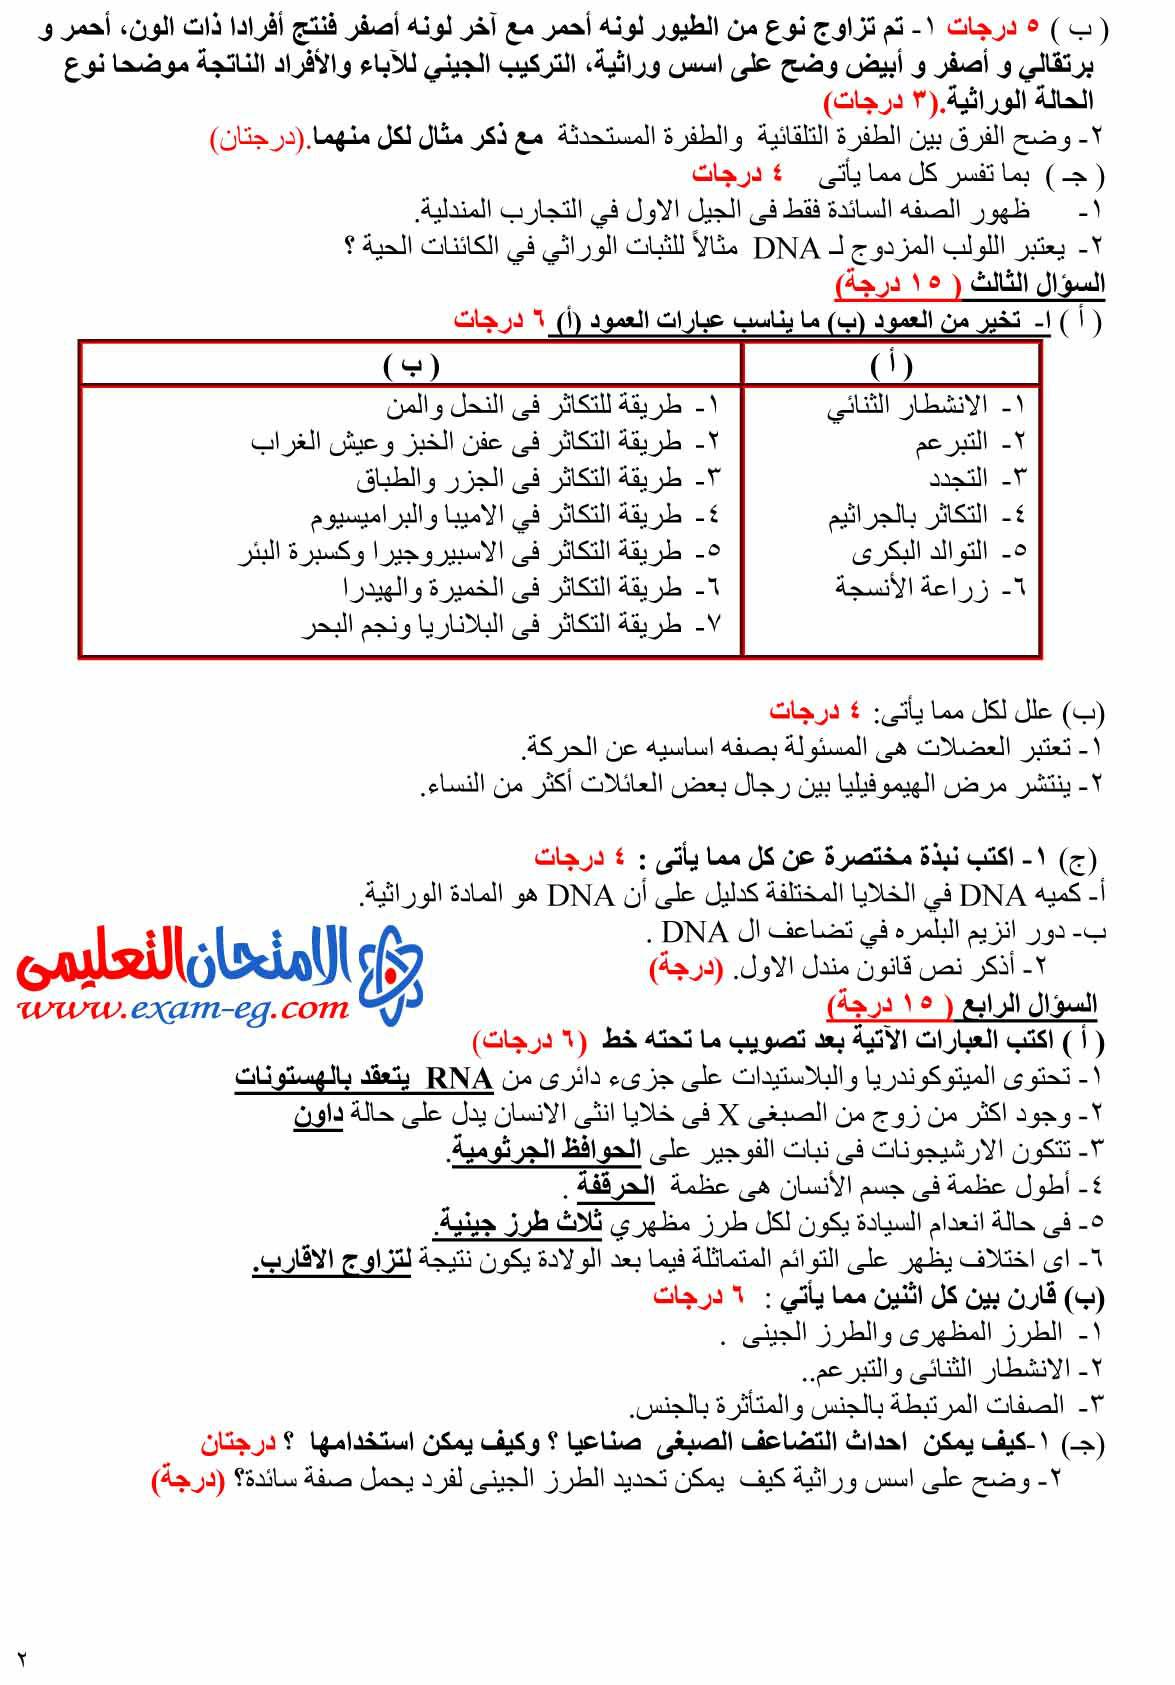 exam-eg.com_1403333594012.jpg